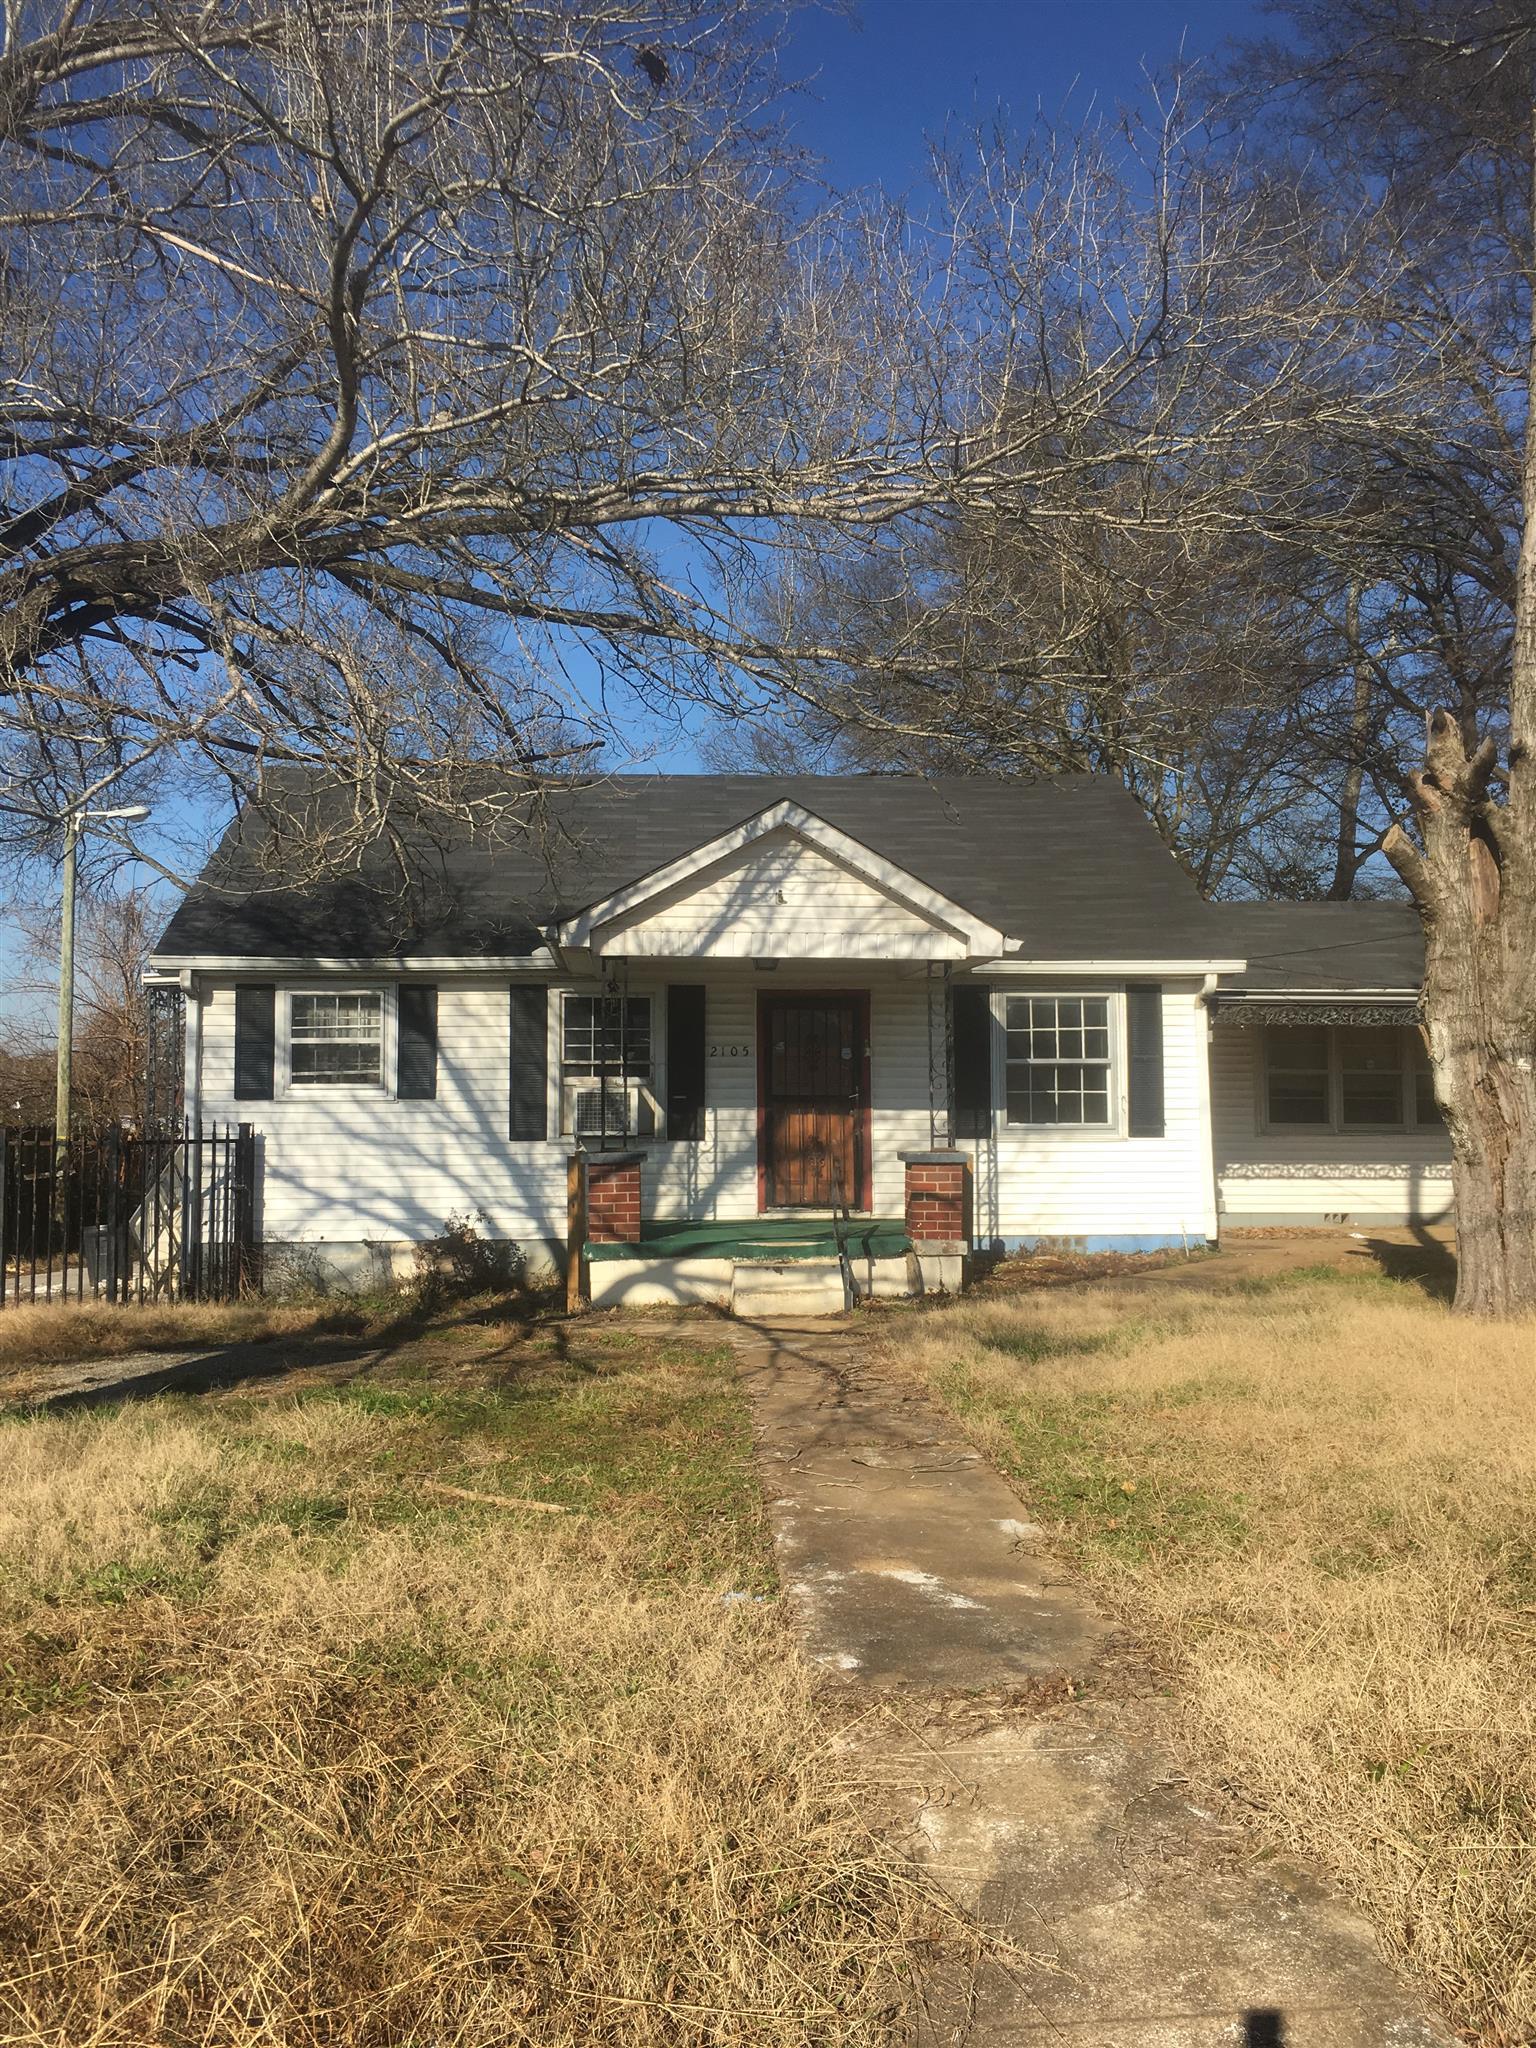 2105 Courtney Ave, Nashville, TN 37218 - Nashville, TN real estate listing